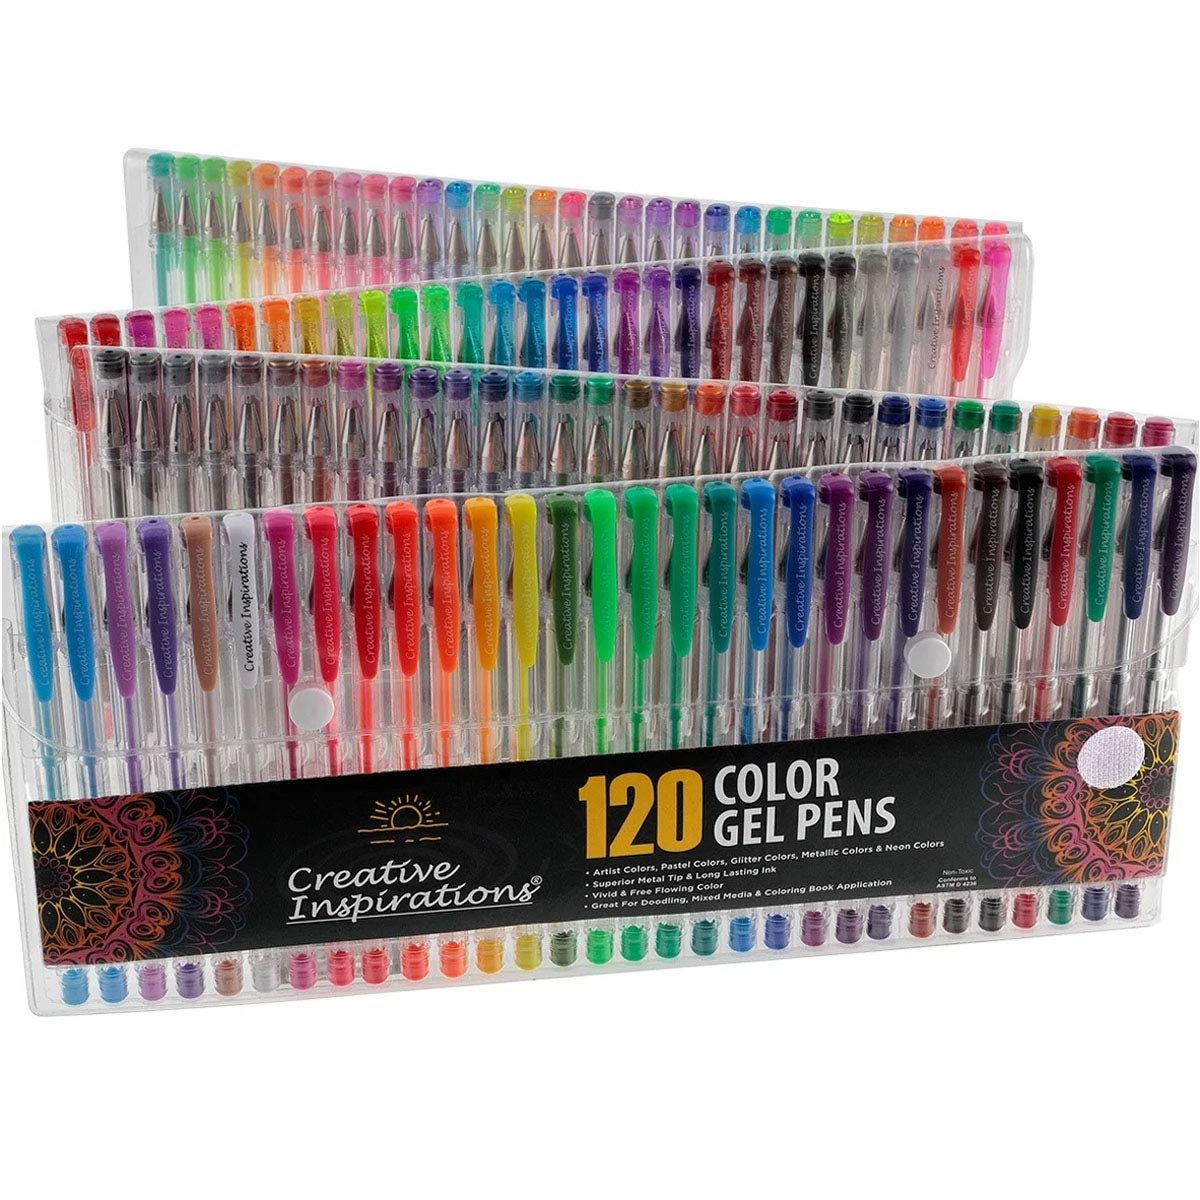 Creative Inspirations 120 Gel Pen Set for Adult Coloring Books, Scrapbooking, Drawing, Metallic, Glitter, Neon, Pastel, Artist Colors New Formula Less Smearing | Assorted Colors by Creative Inspirations